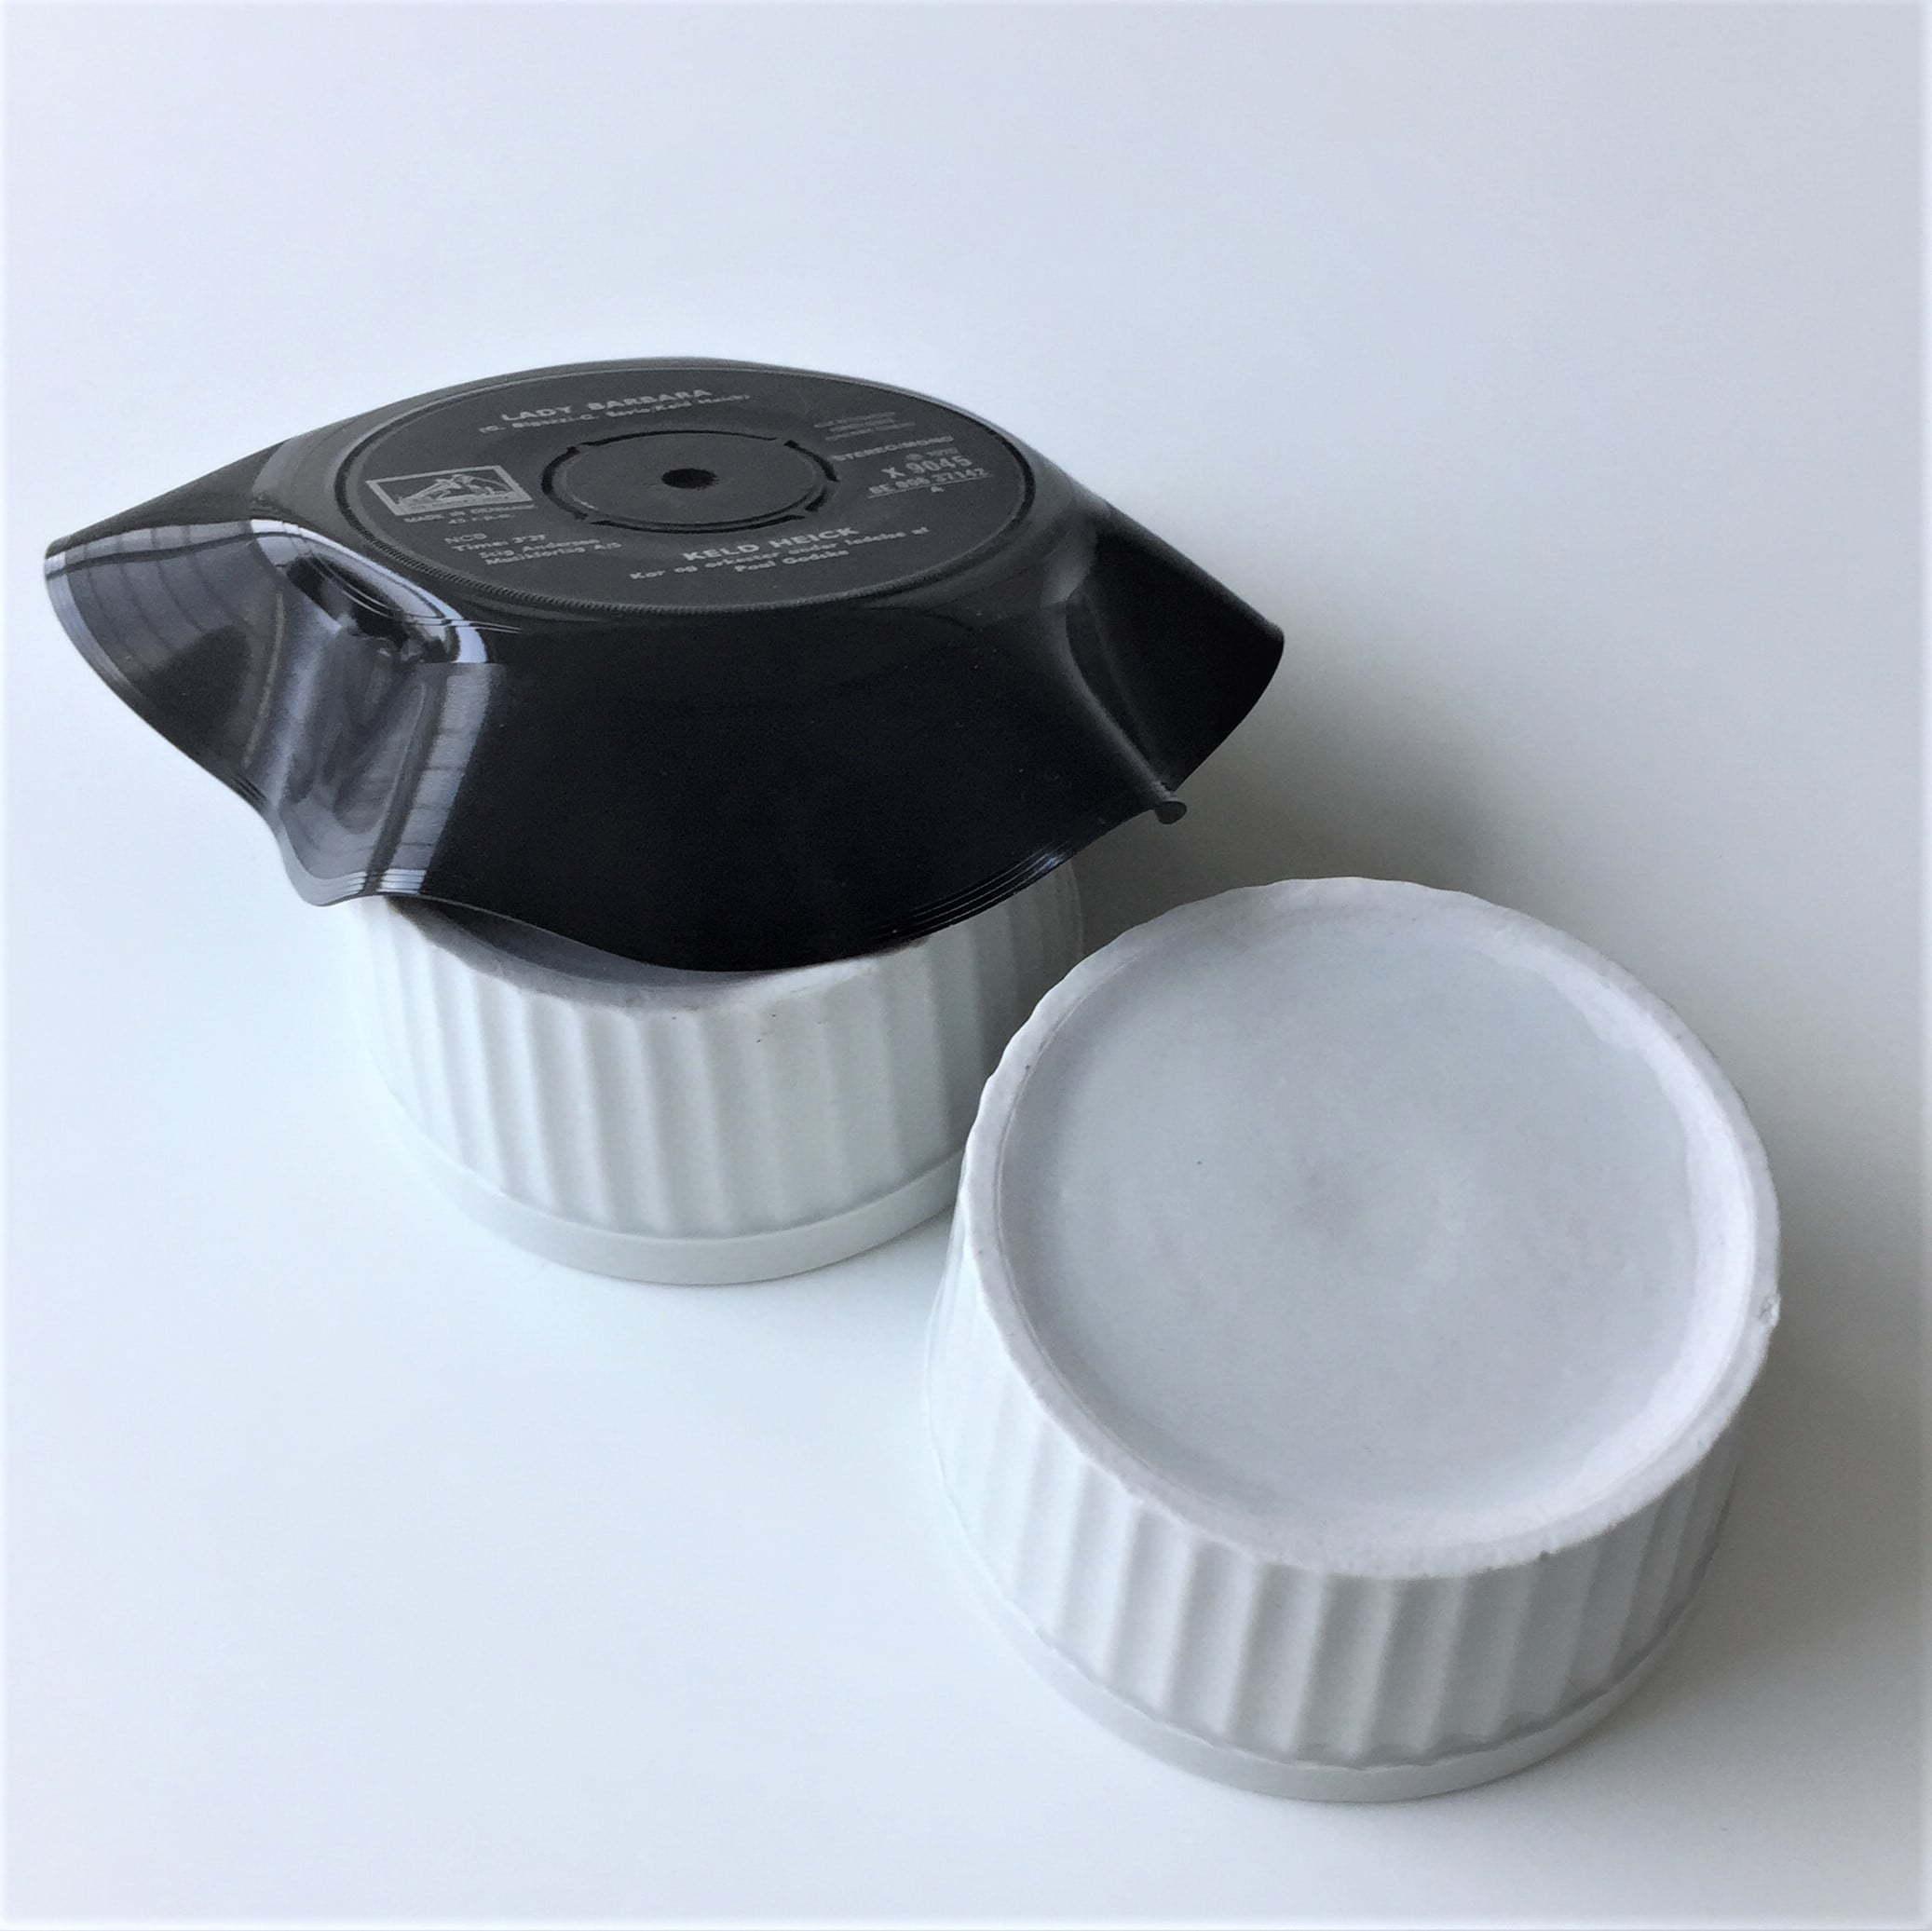 grammofonplade skl mgp